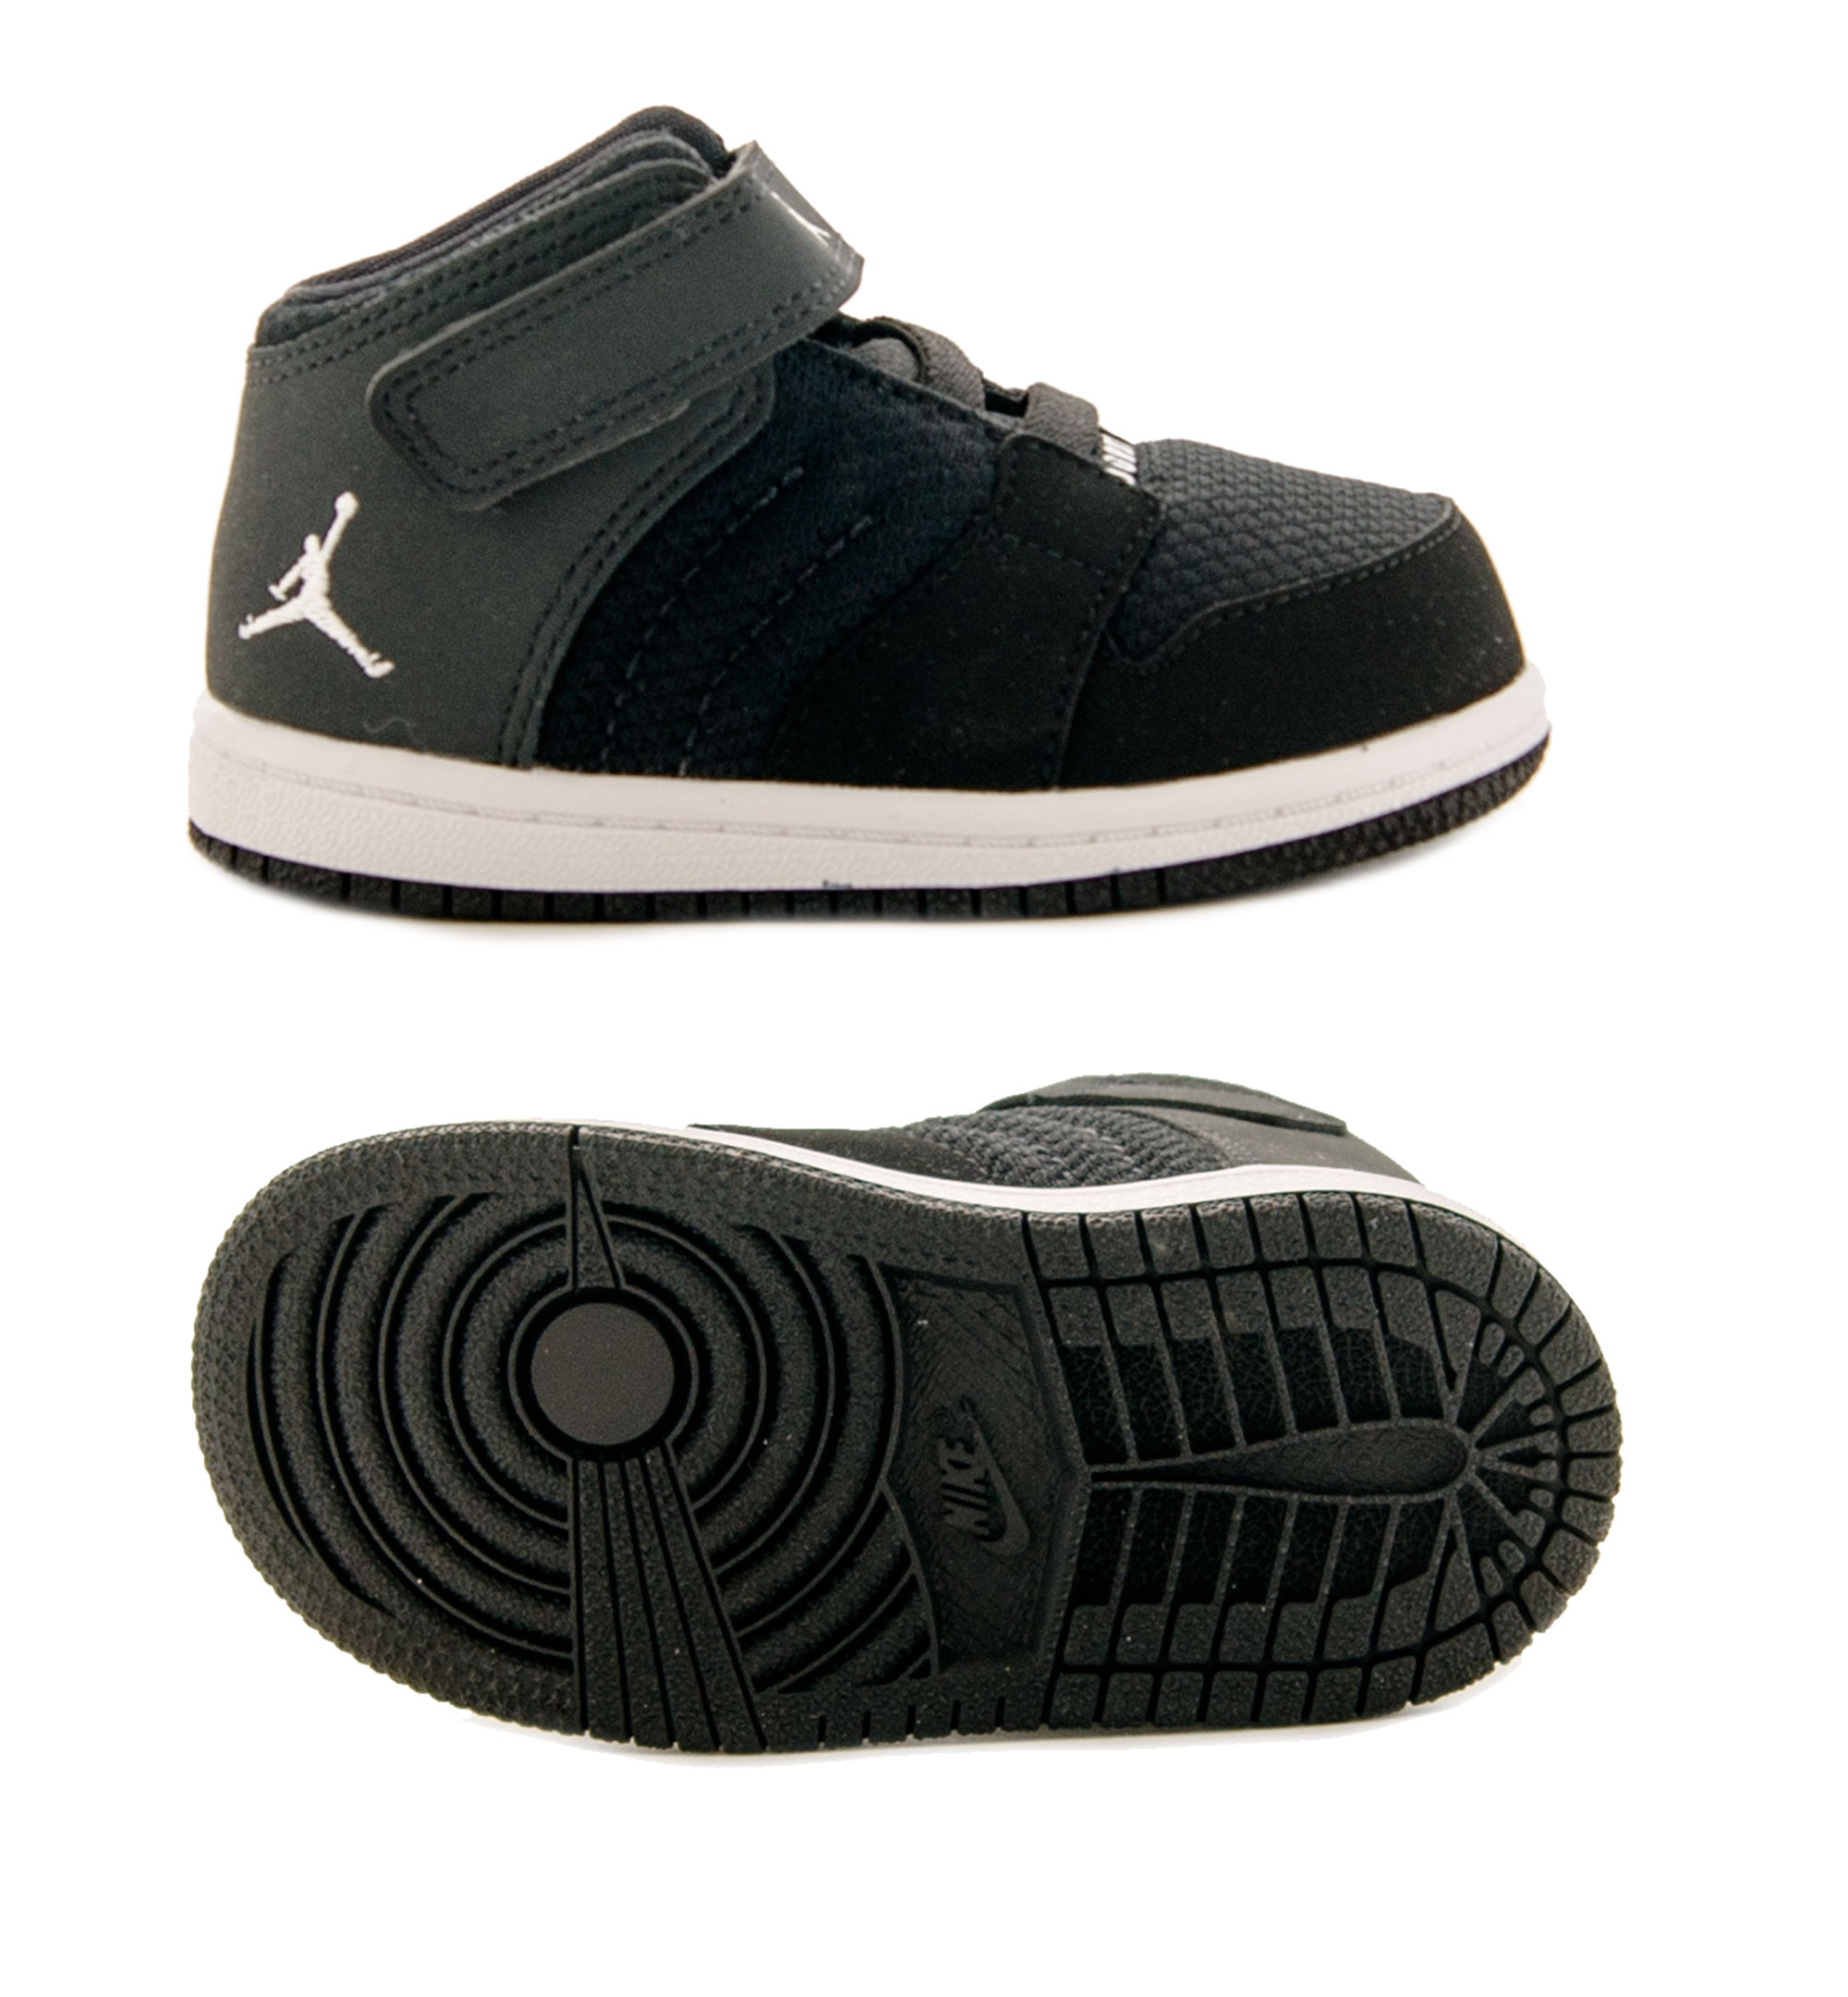 Buty dziecięce Nike Jordan 1 Flight 4 PREMIUM Gt